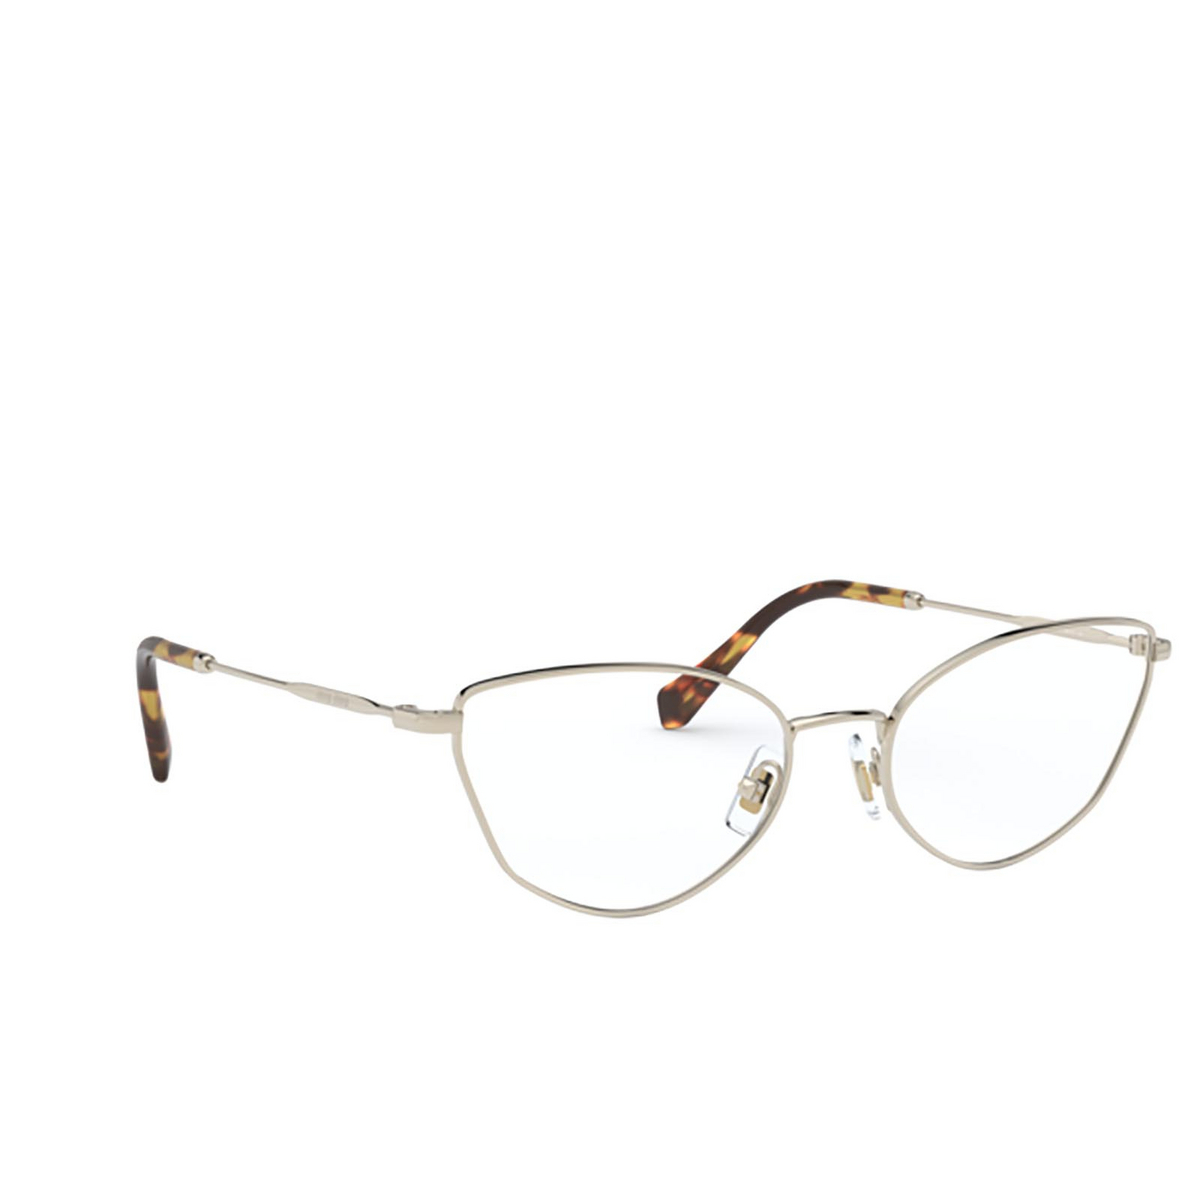 Miu Miu® Cat-eye Eyeglasses: MU 51SV color Pale Gold ZVN1O1 - three-quarters view.